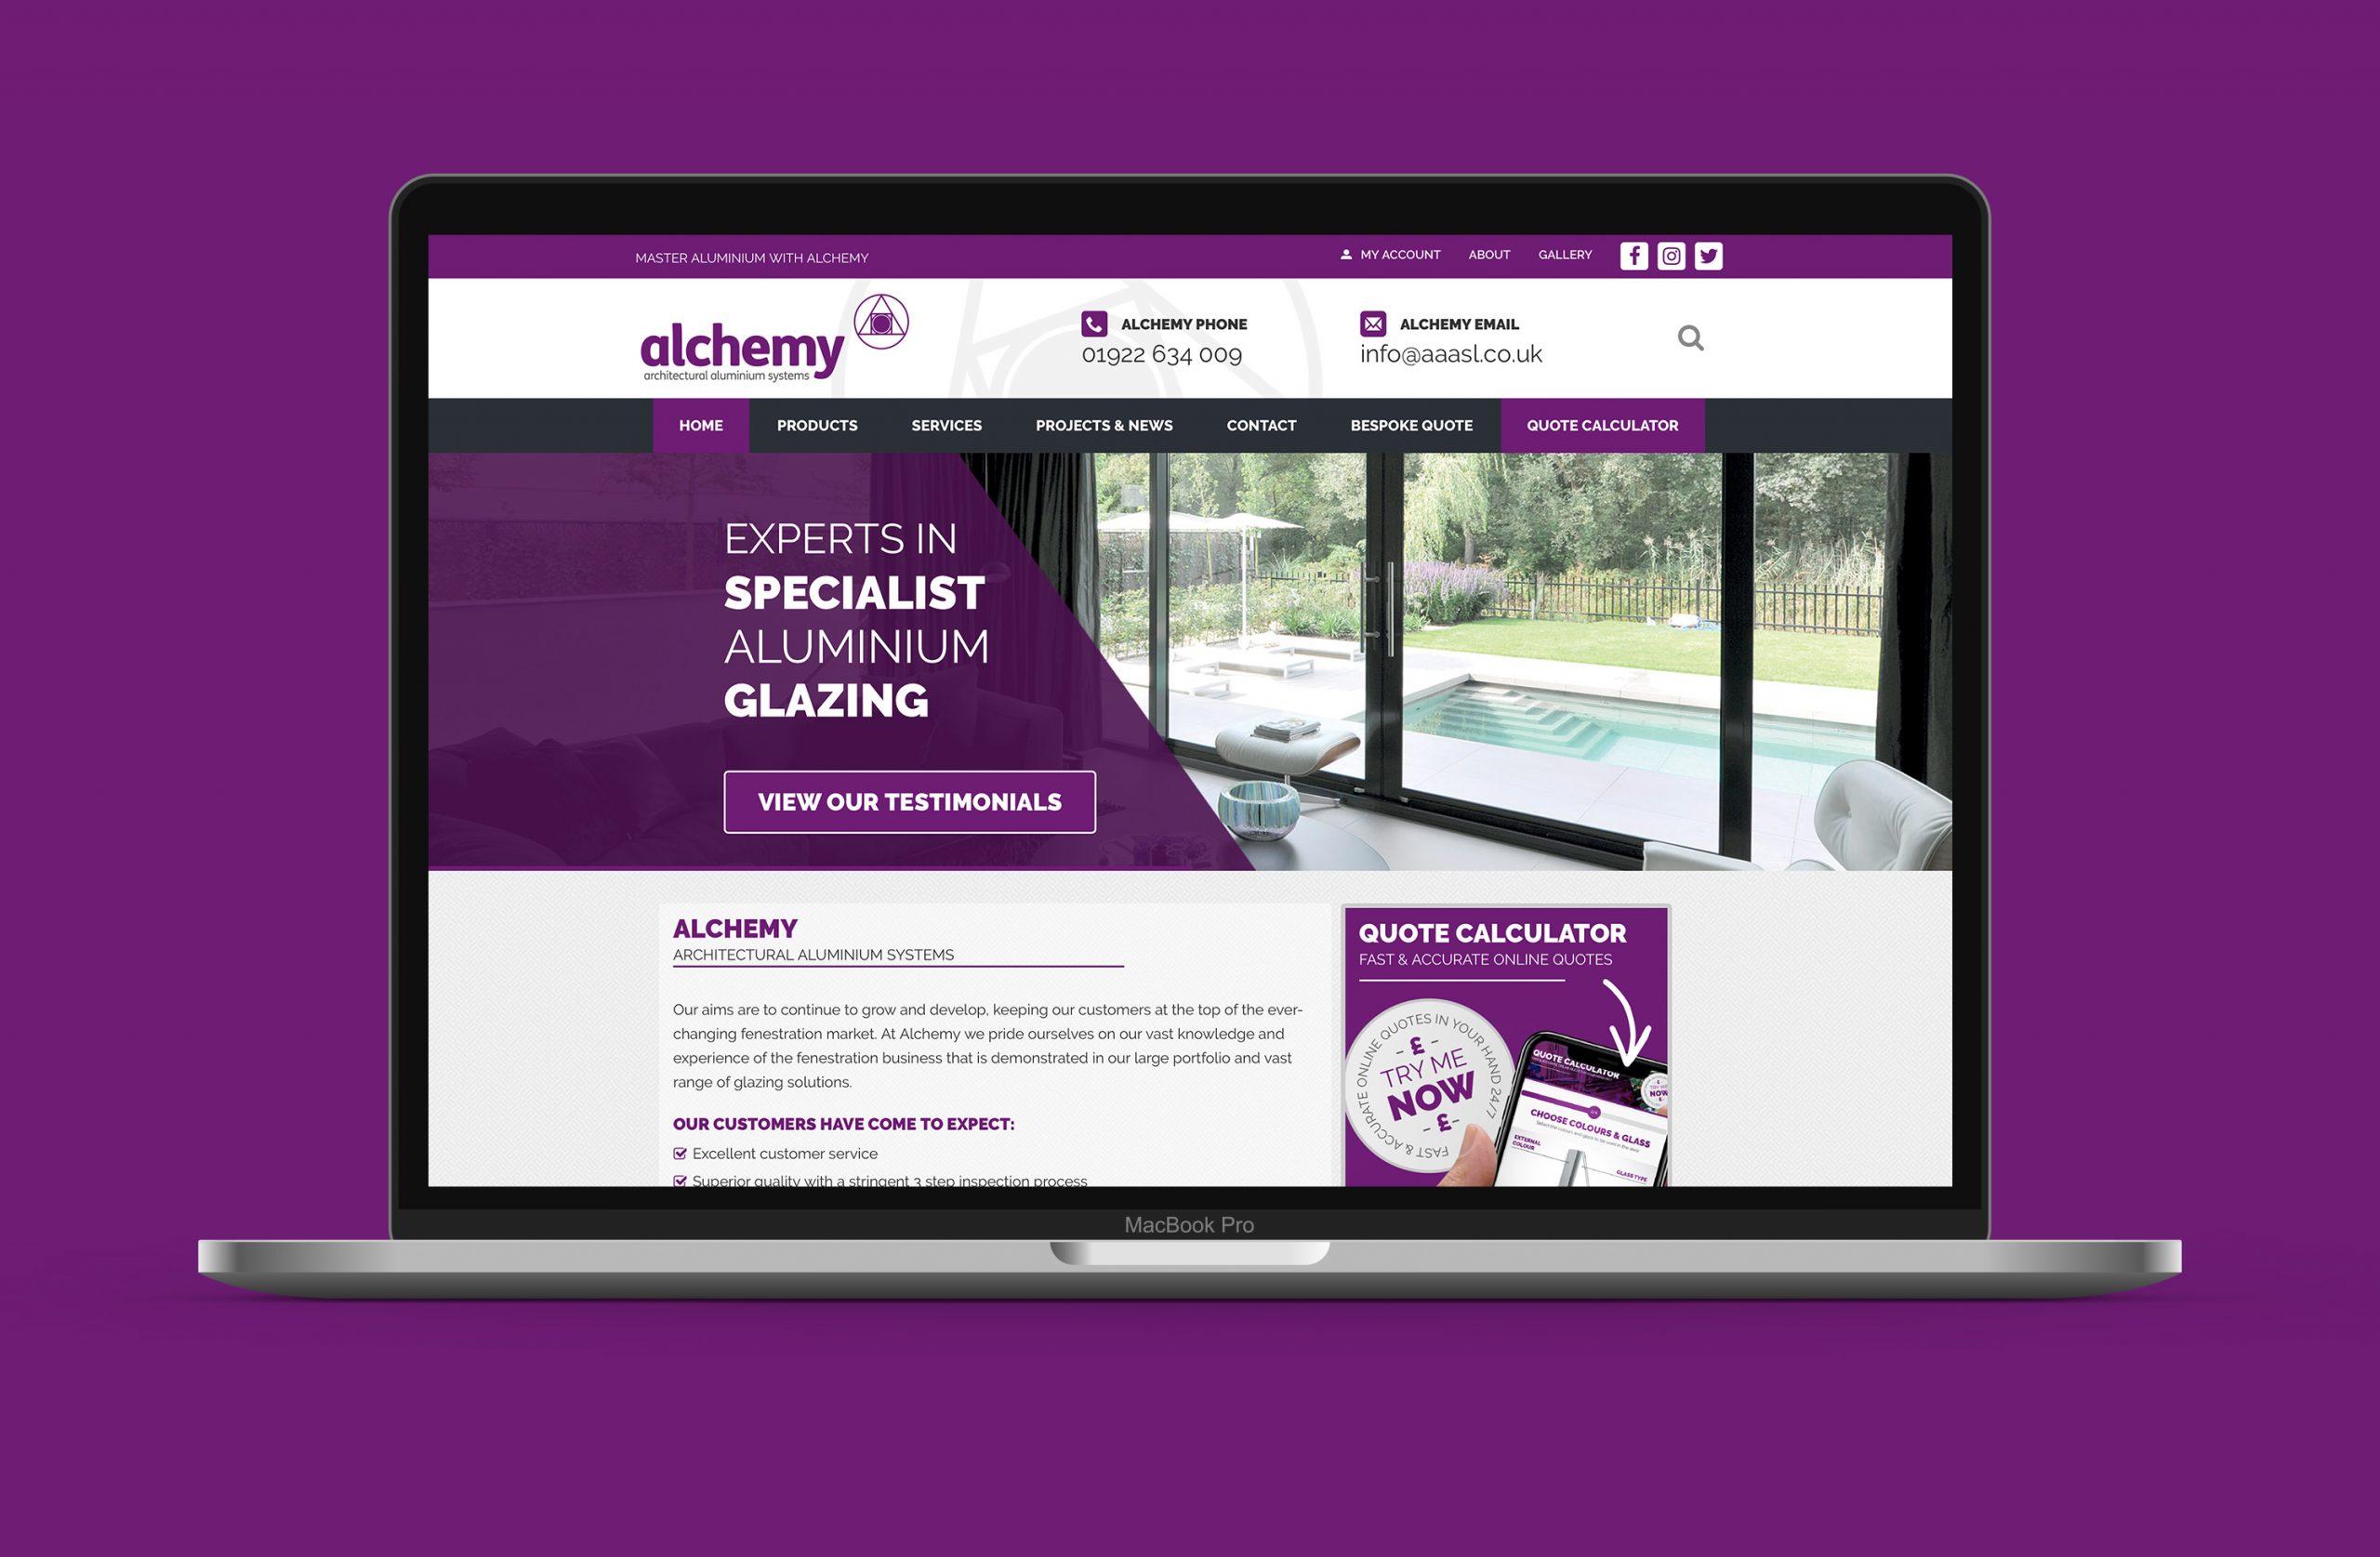 Alchemy home page